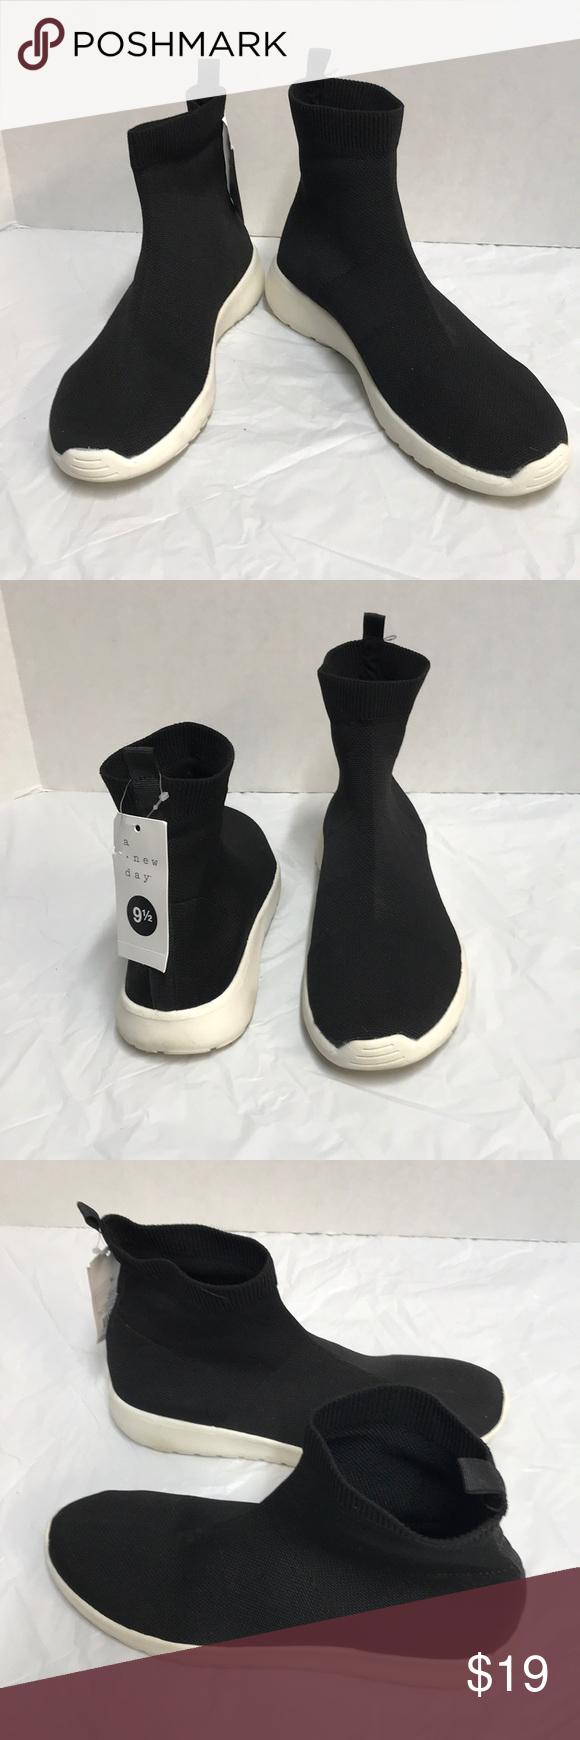 Women's Randi High Sock Sneakers